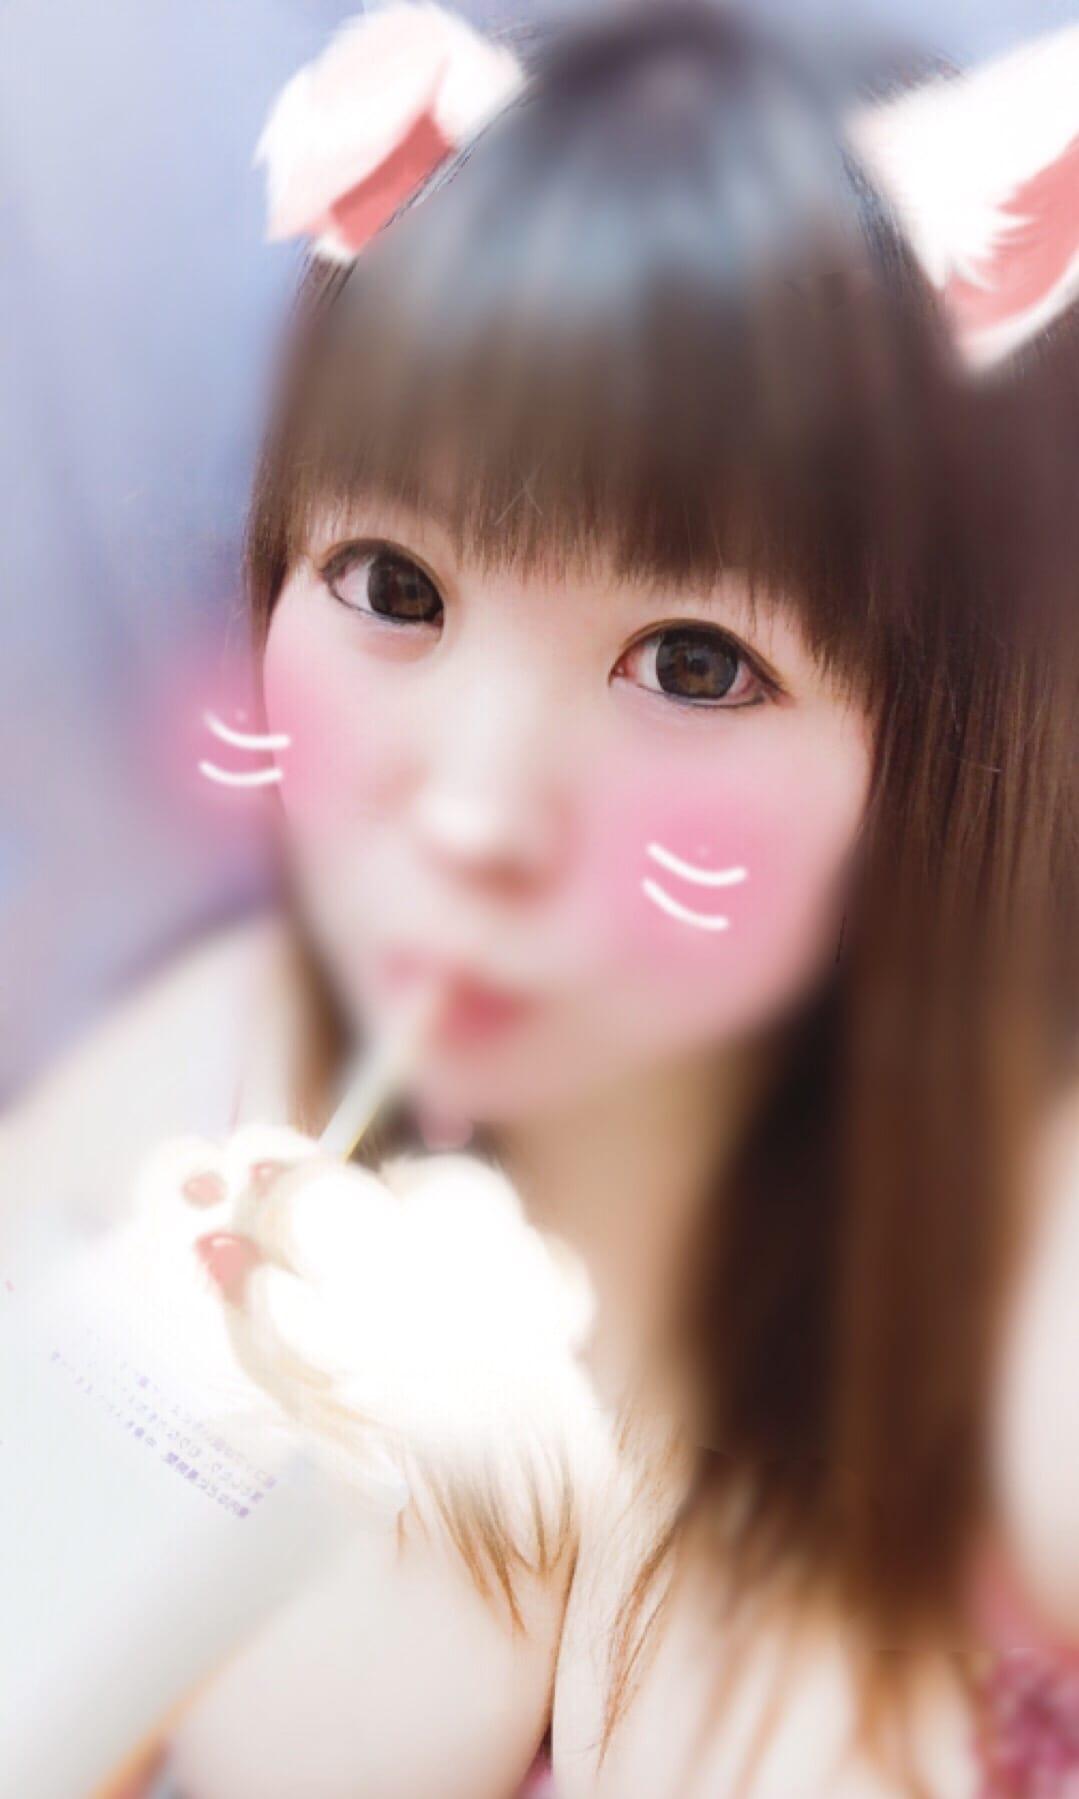 「LUXの勇者様♪」01/16(01/16) 00:52 | 七愛(なな)の写メ・風俗動画